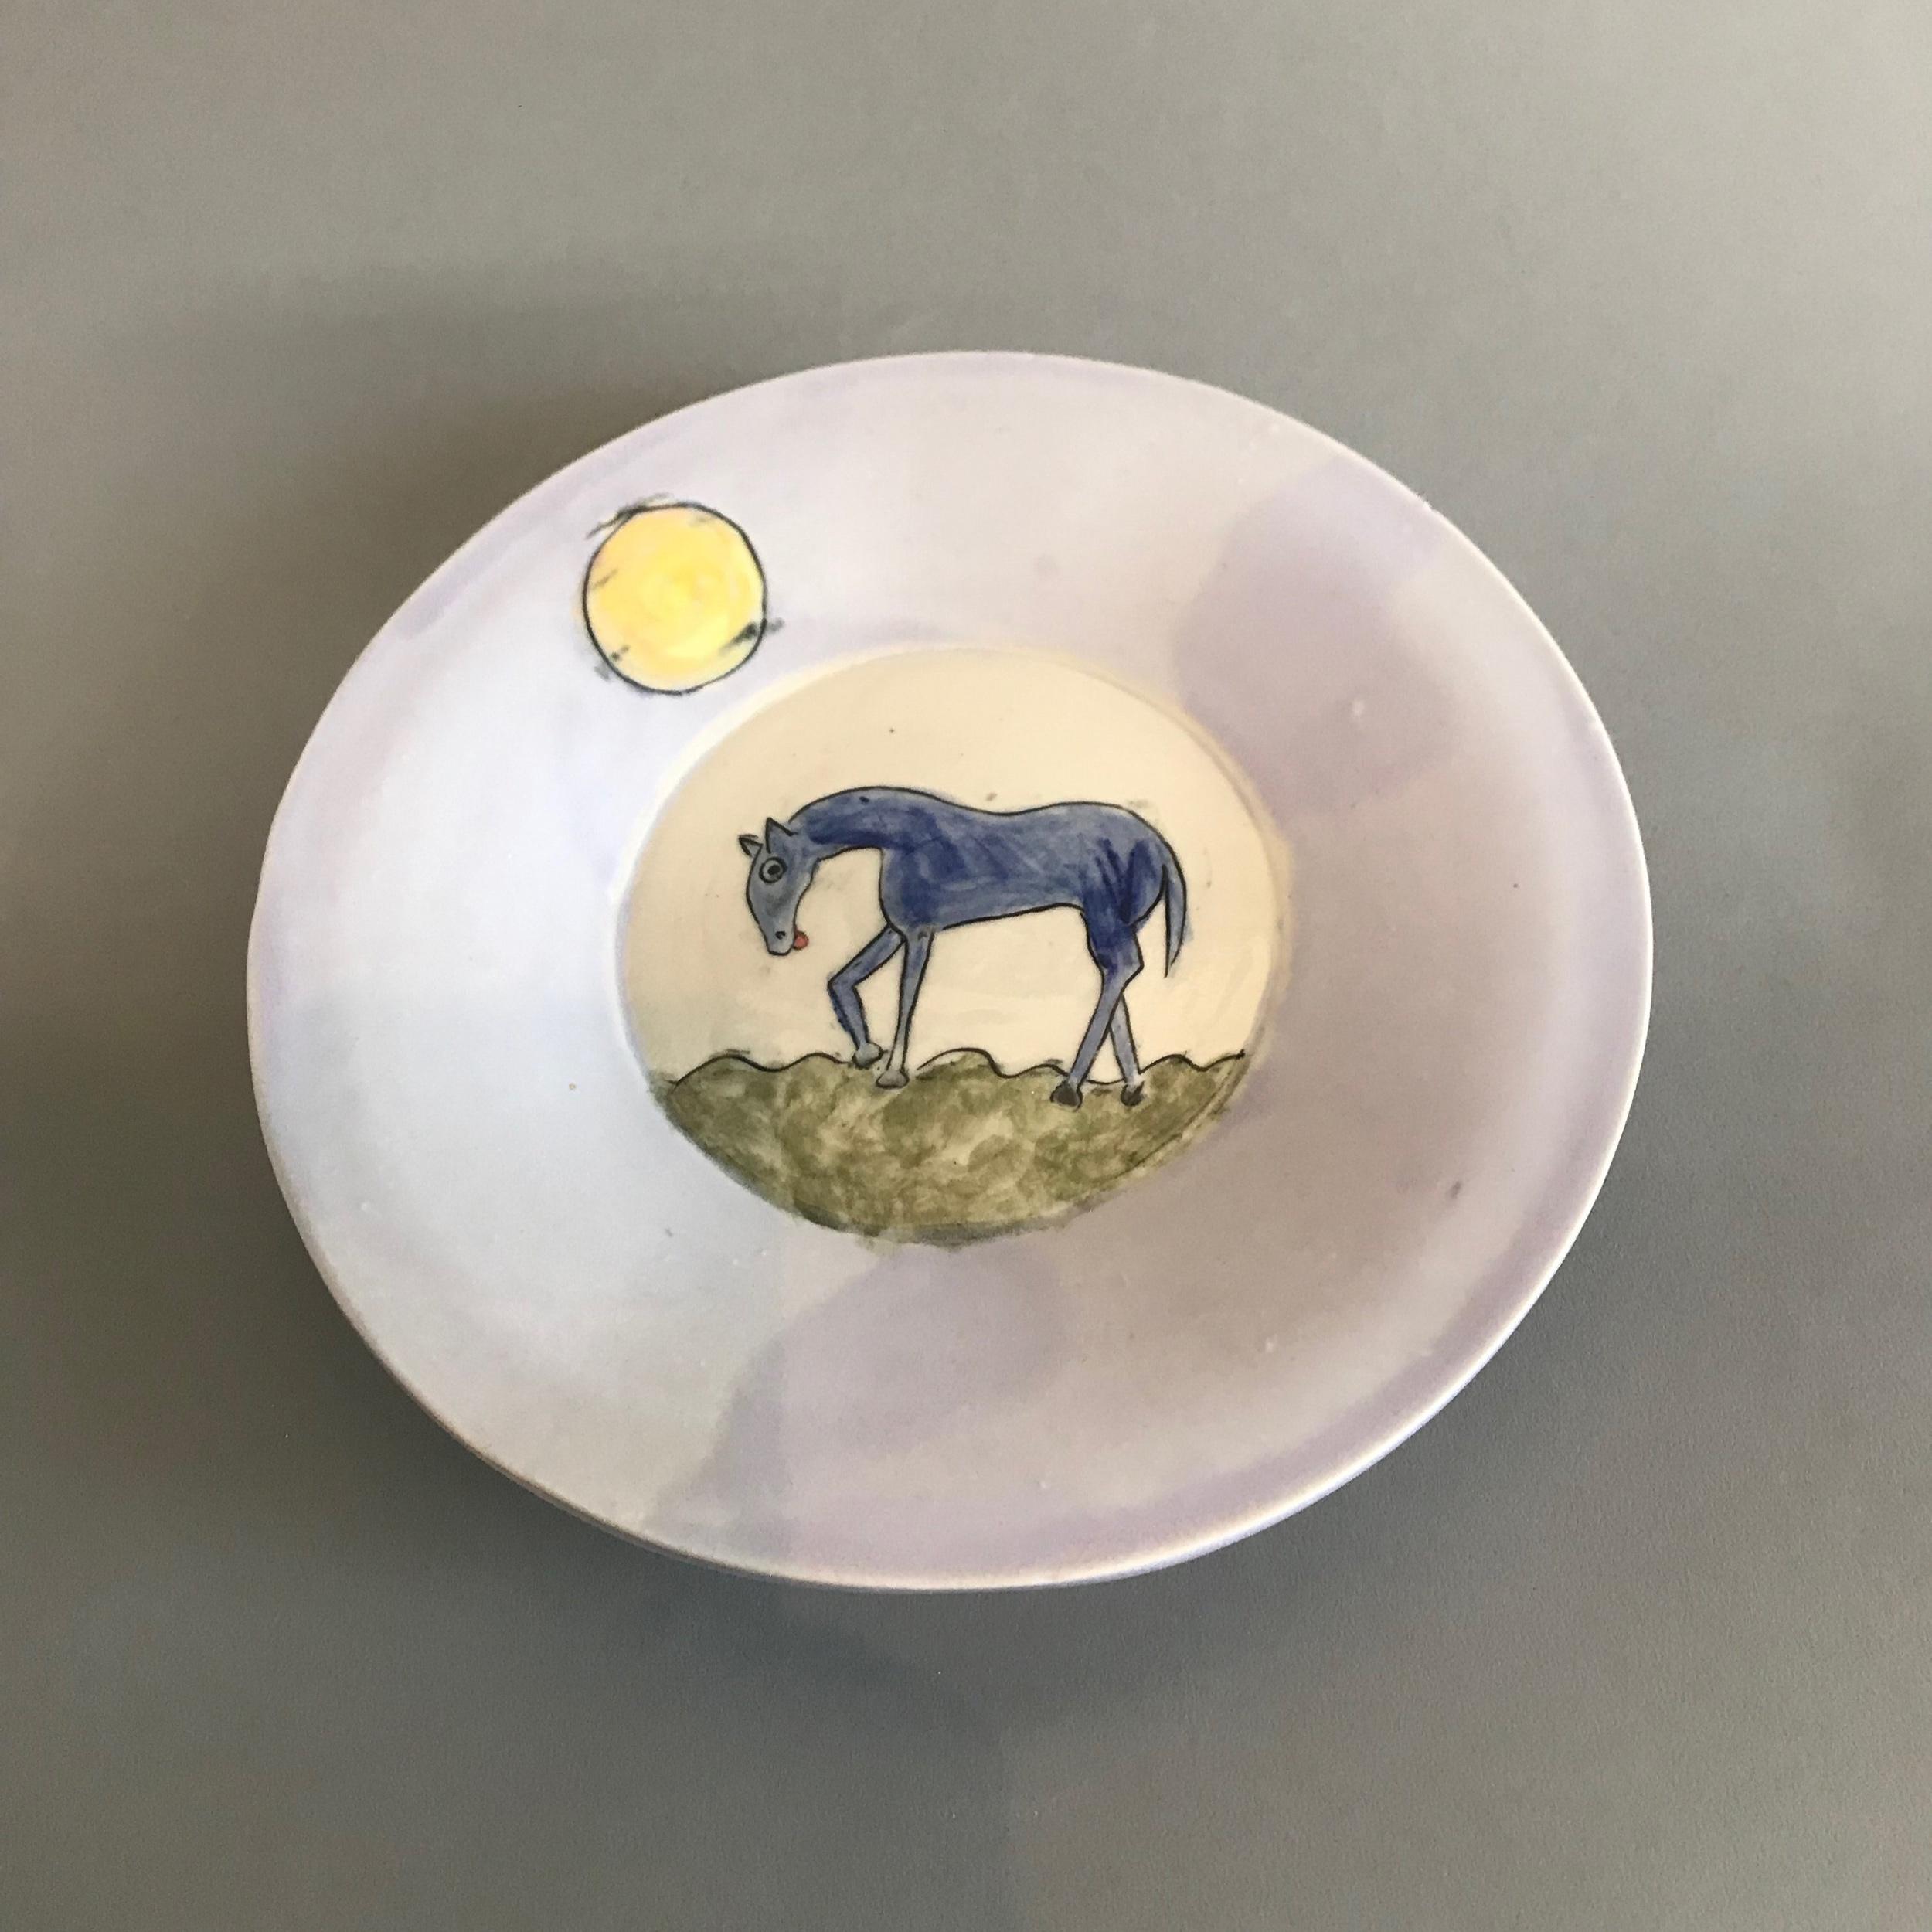 Horse Plate (6%22).jpg